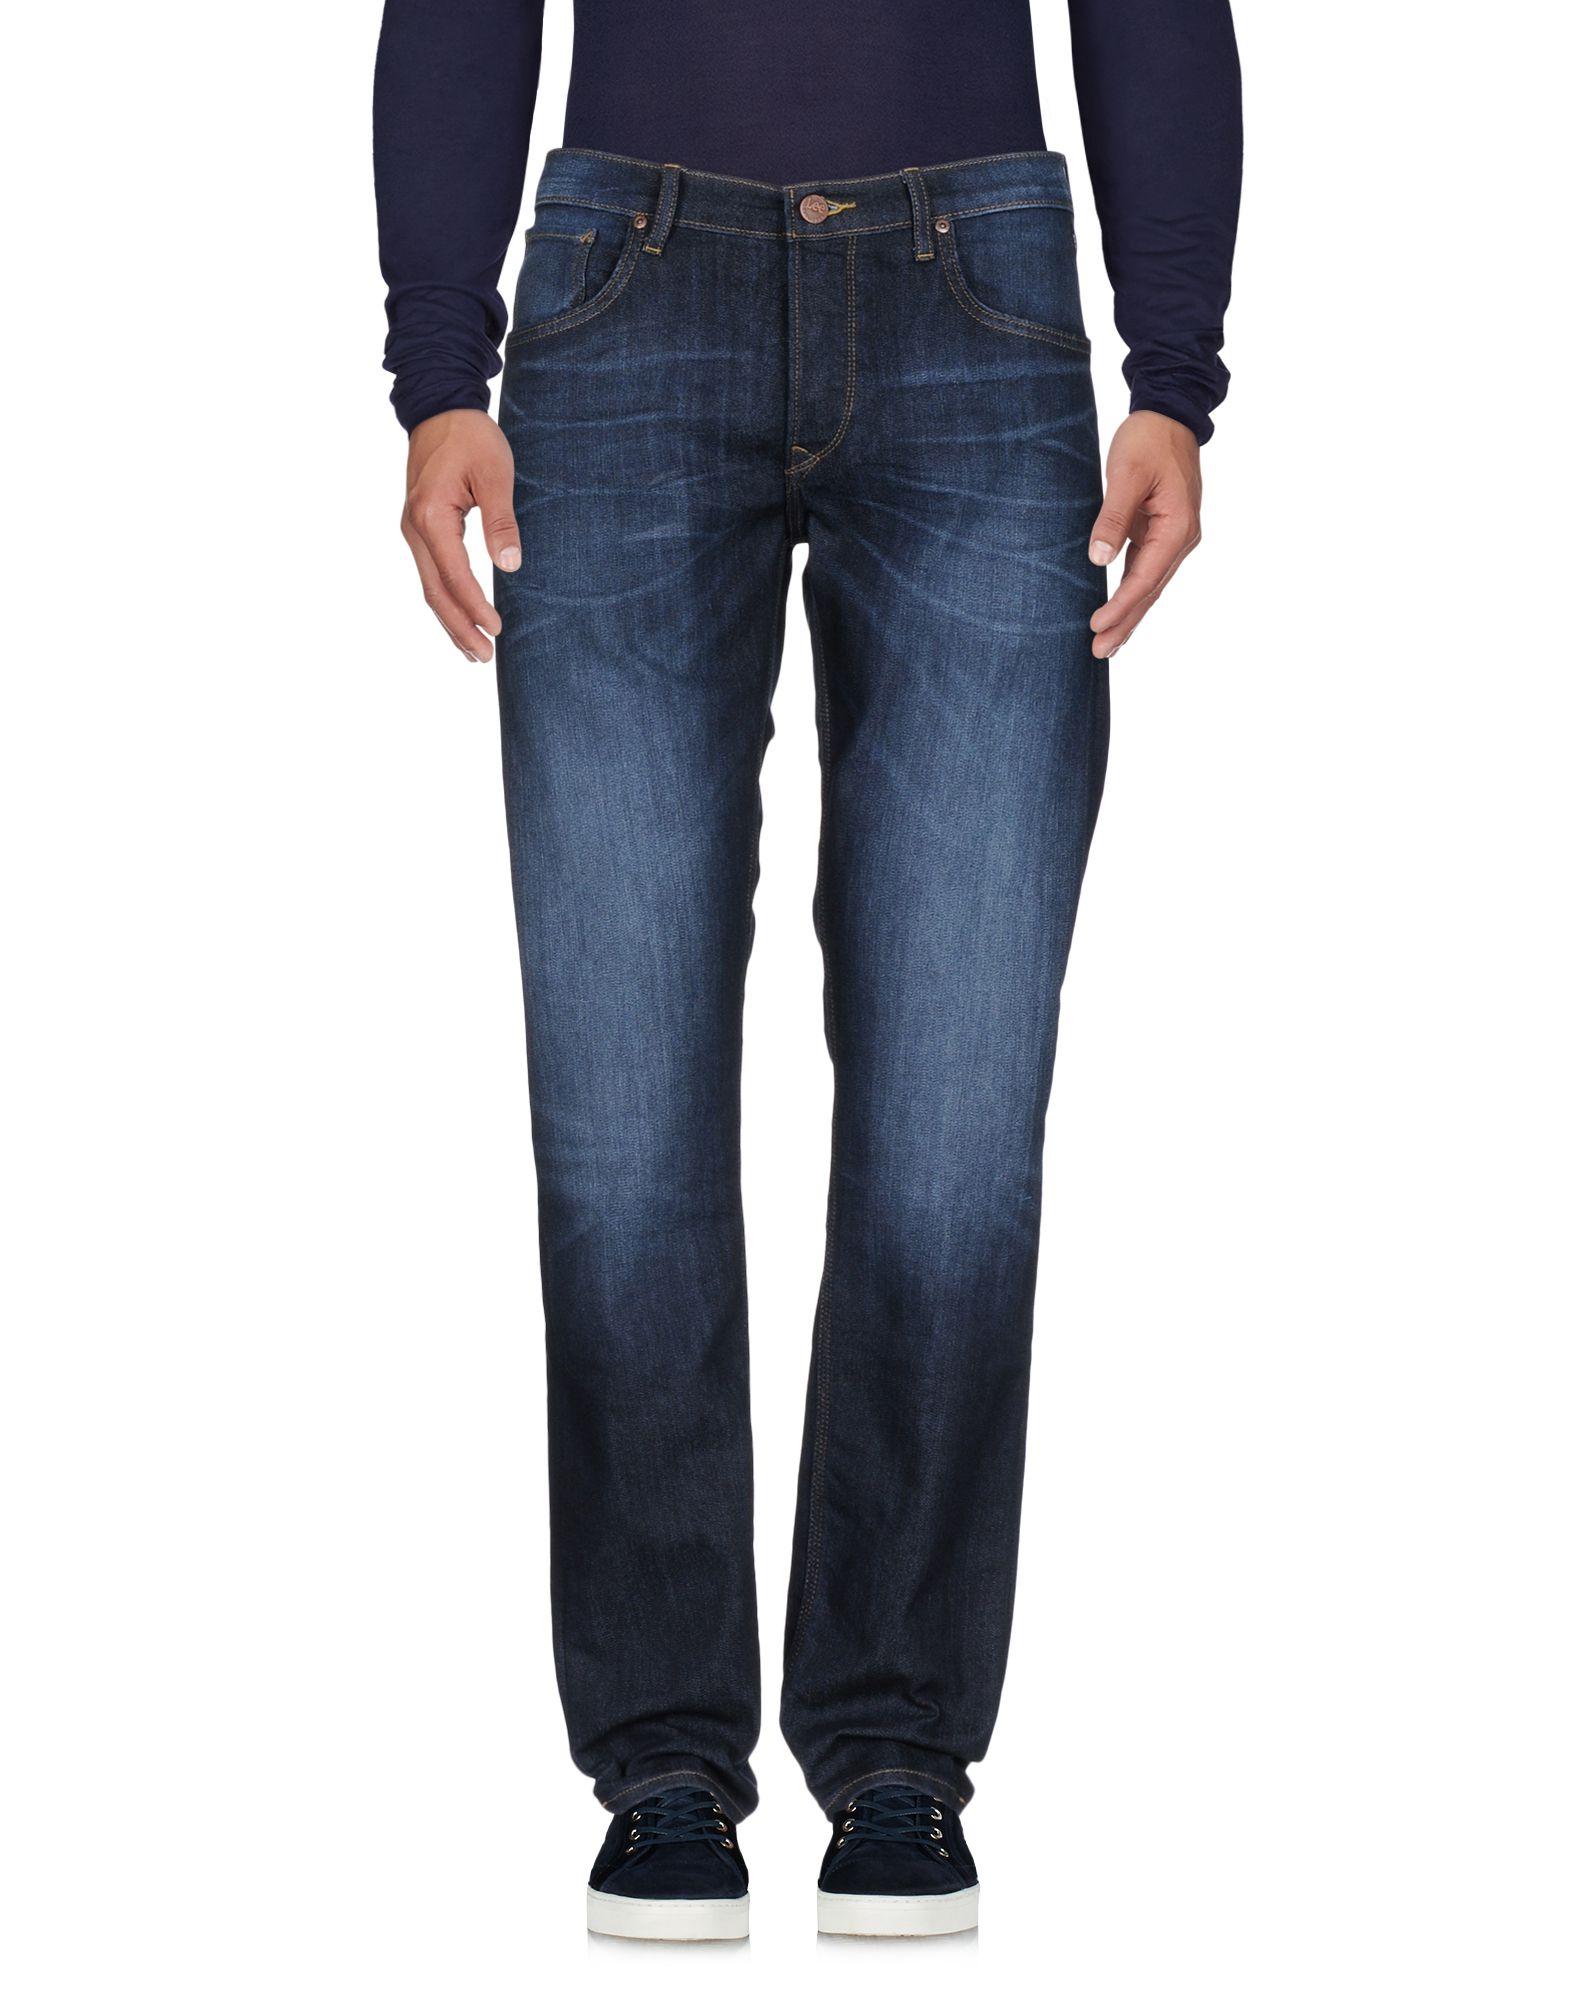 Pantaloni Jeans Lee Uomo - - Uomo 42668927EJ fee70a